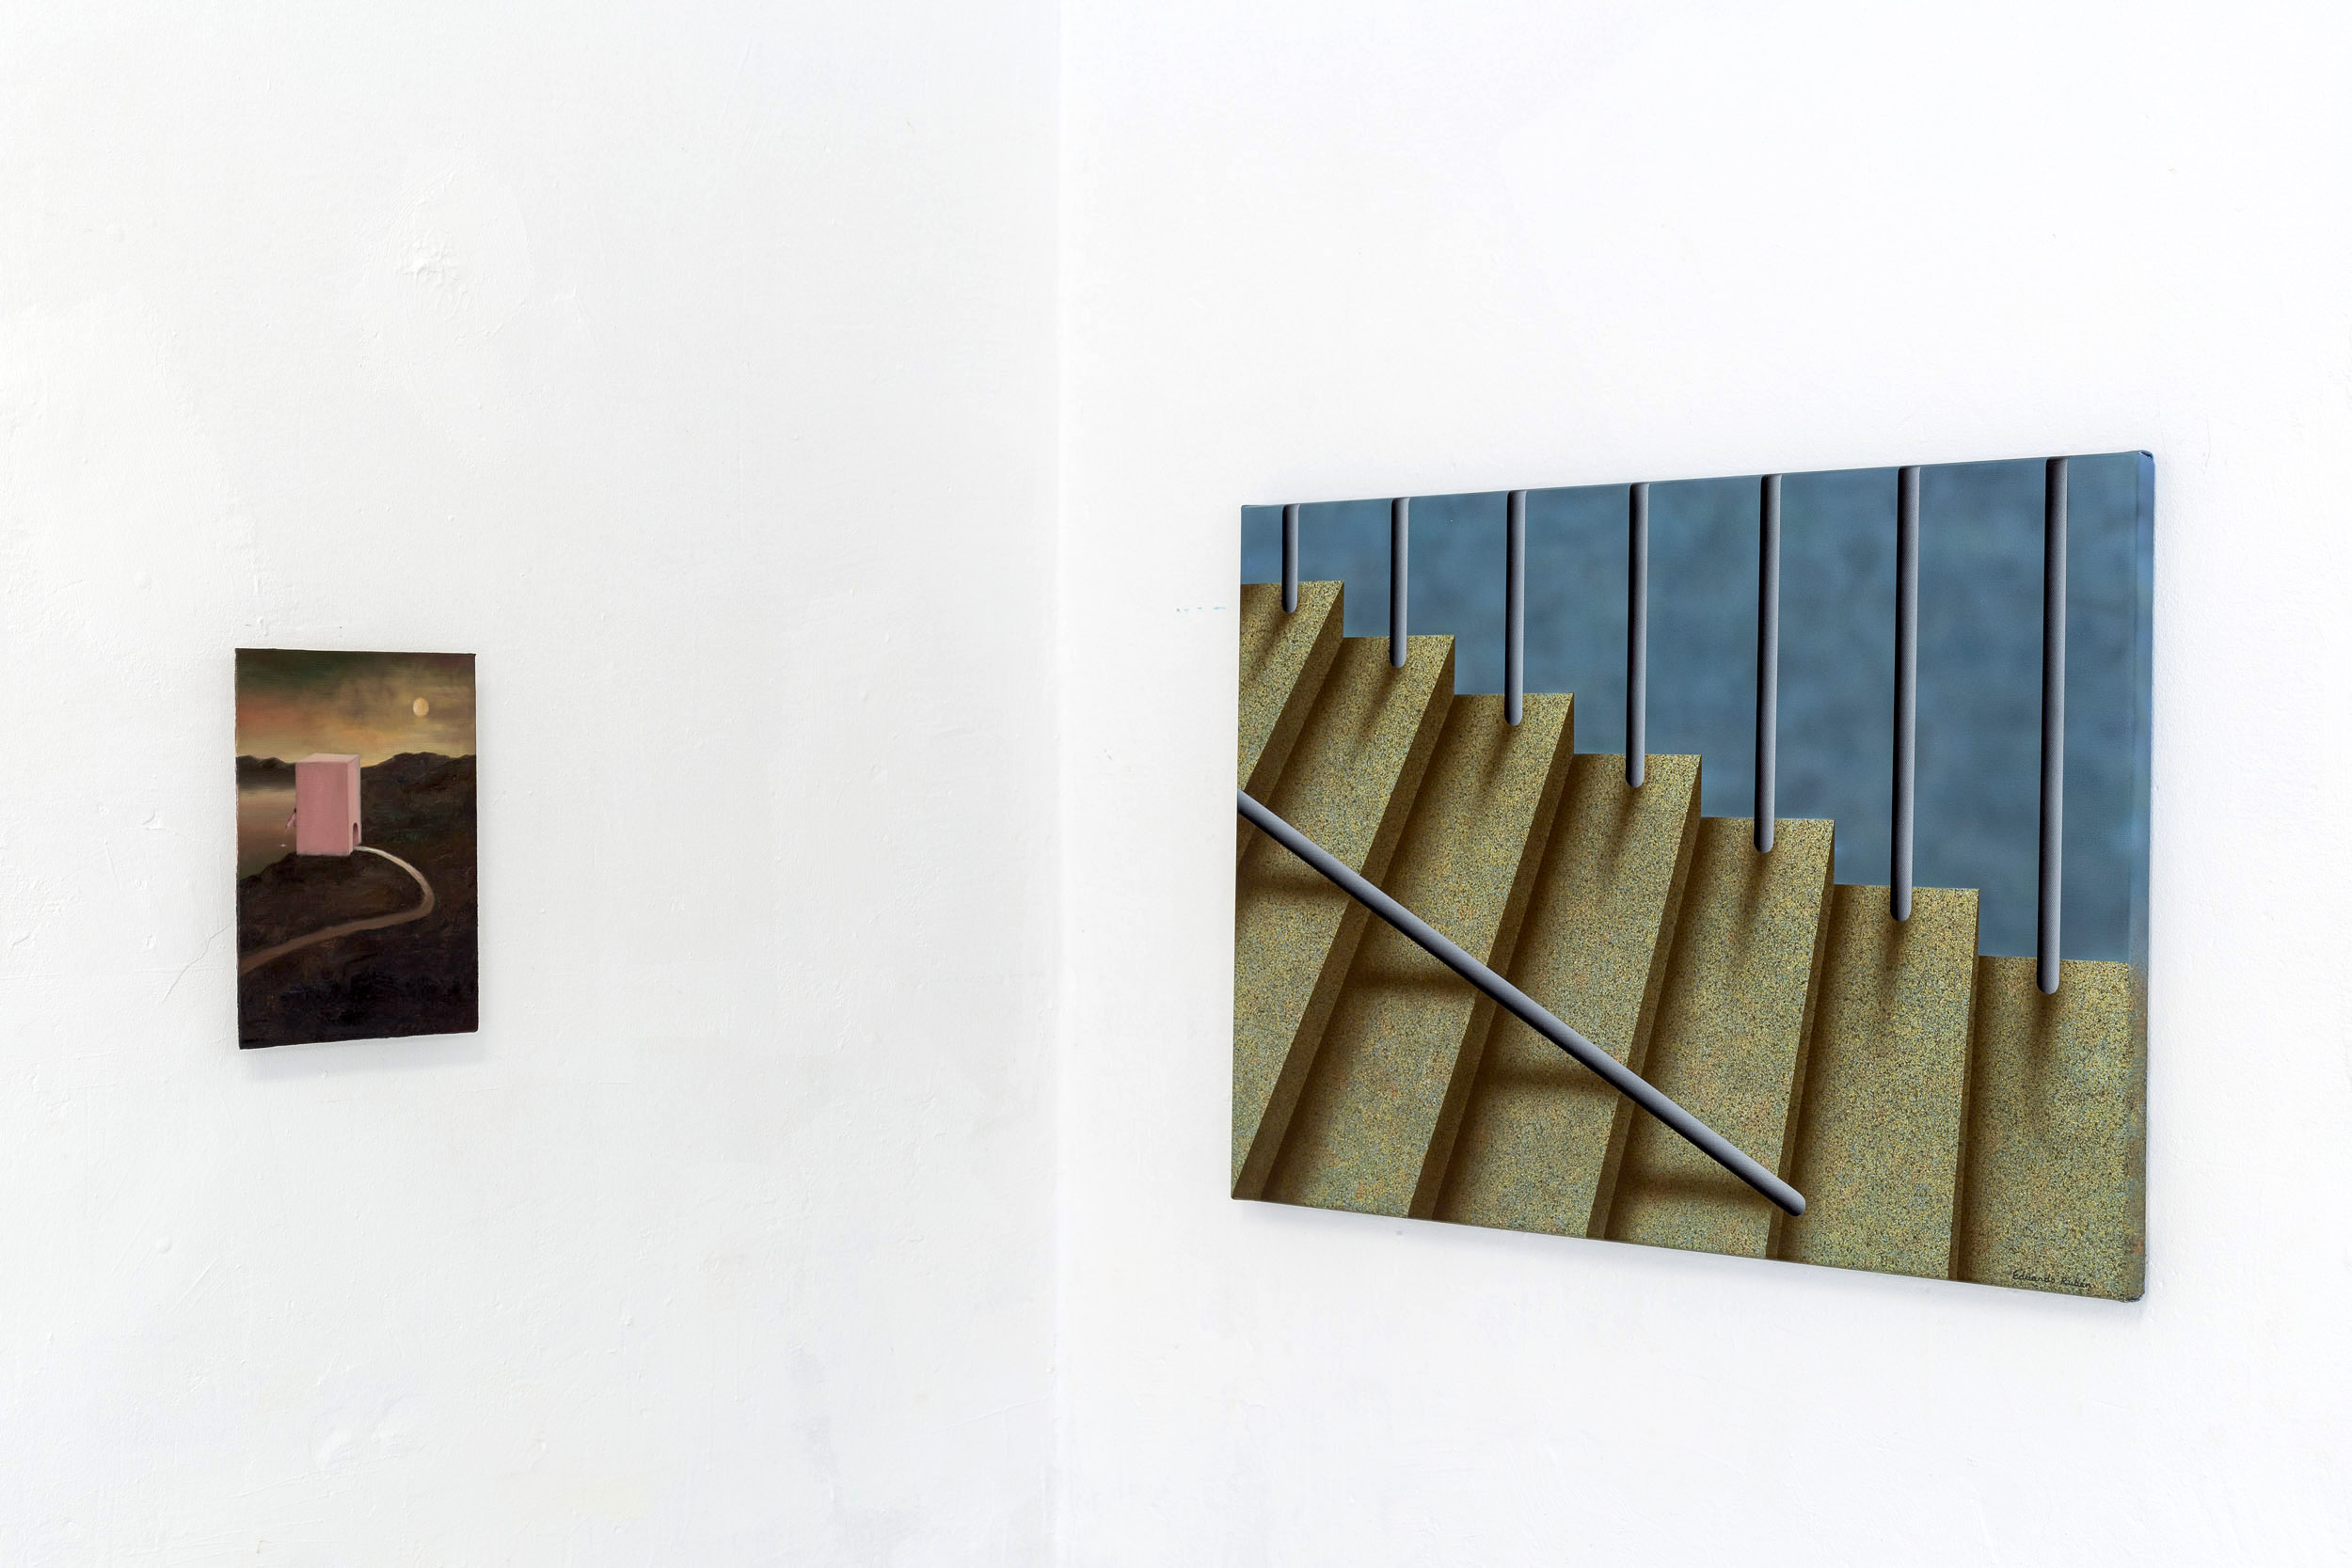 Left: Francisco Sierra,  NewExBolígrafo  (series), 2015-ongoing, oil on board, 24 x 18 cm  Right: Eduardo Rubén,  Untitled , 2014, acrylic on canvas, 50 x 70 cm  Photo: Kilian Bannwart